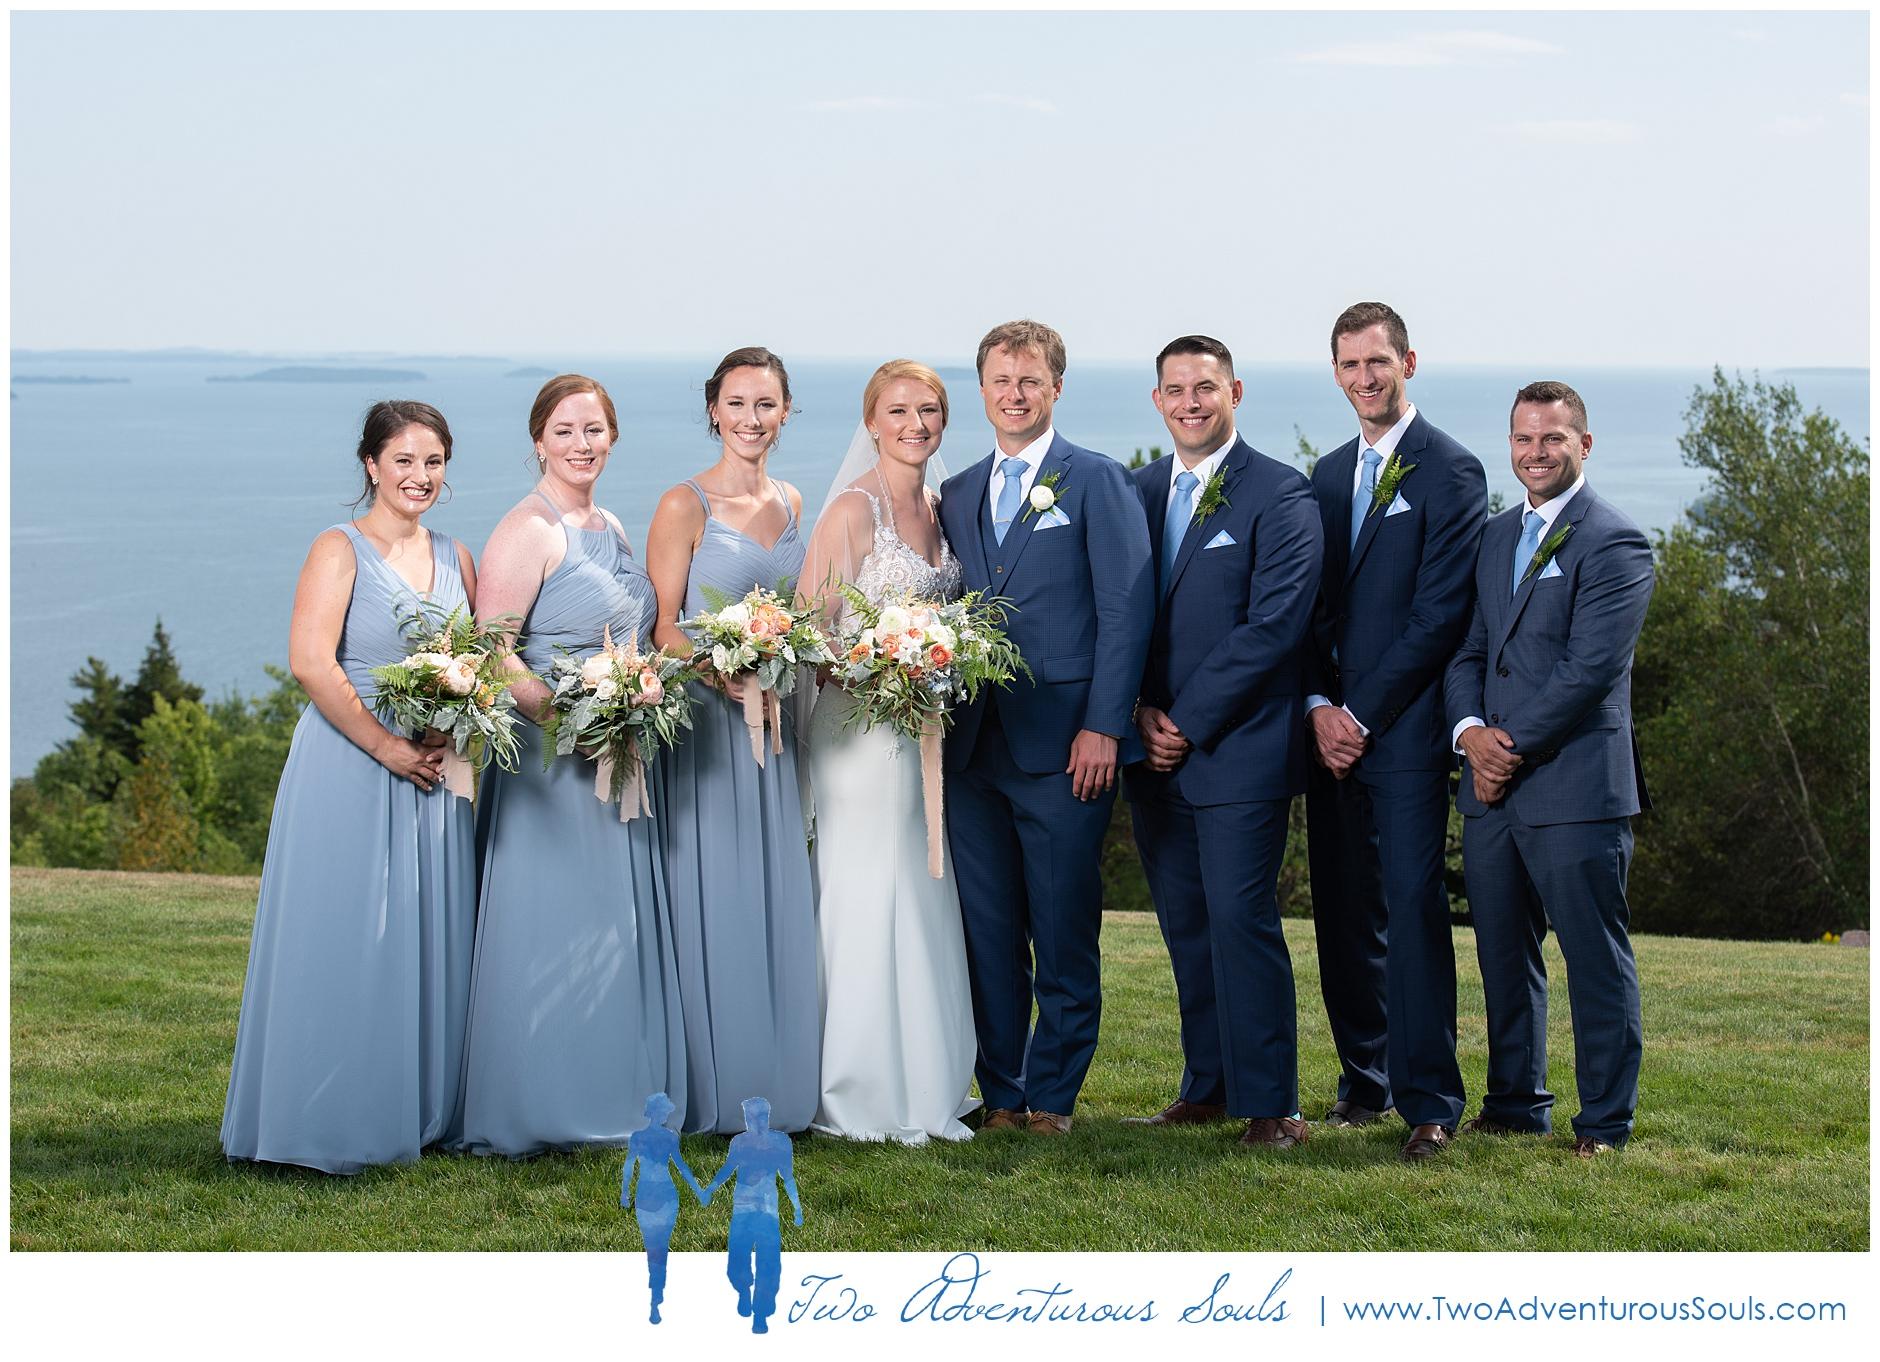 Maine Wedding Photographers, Point Lookout Wedding Photographers, Maine Elopement Photographers, Two Adventurous Souls-0080419_0028.jpg